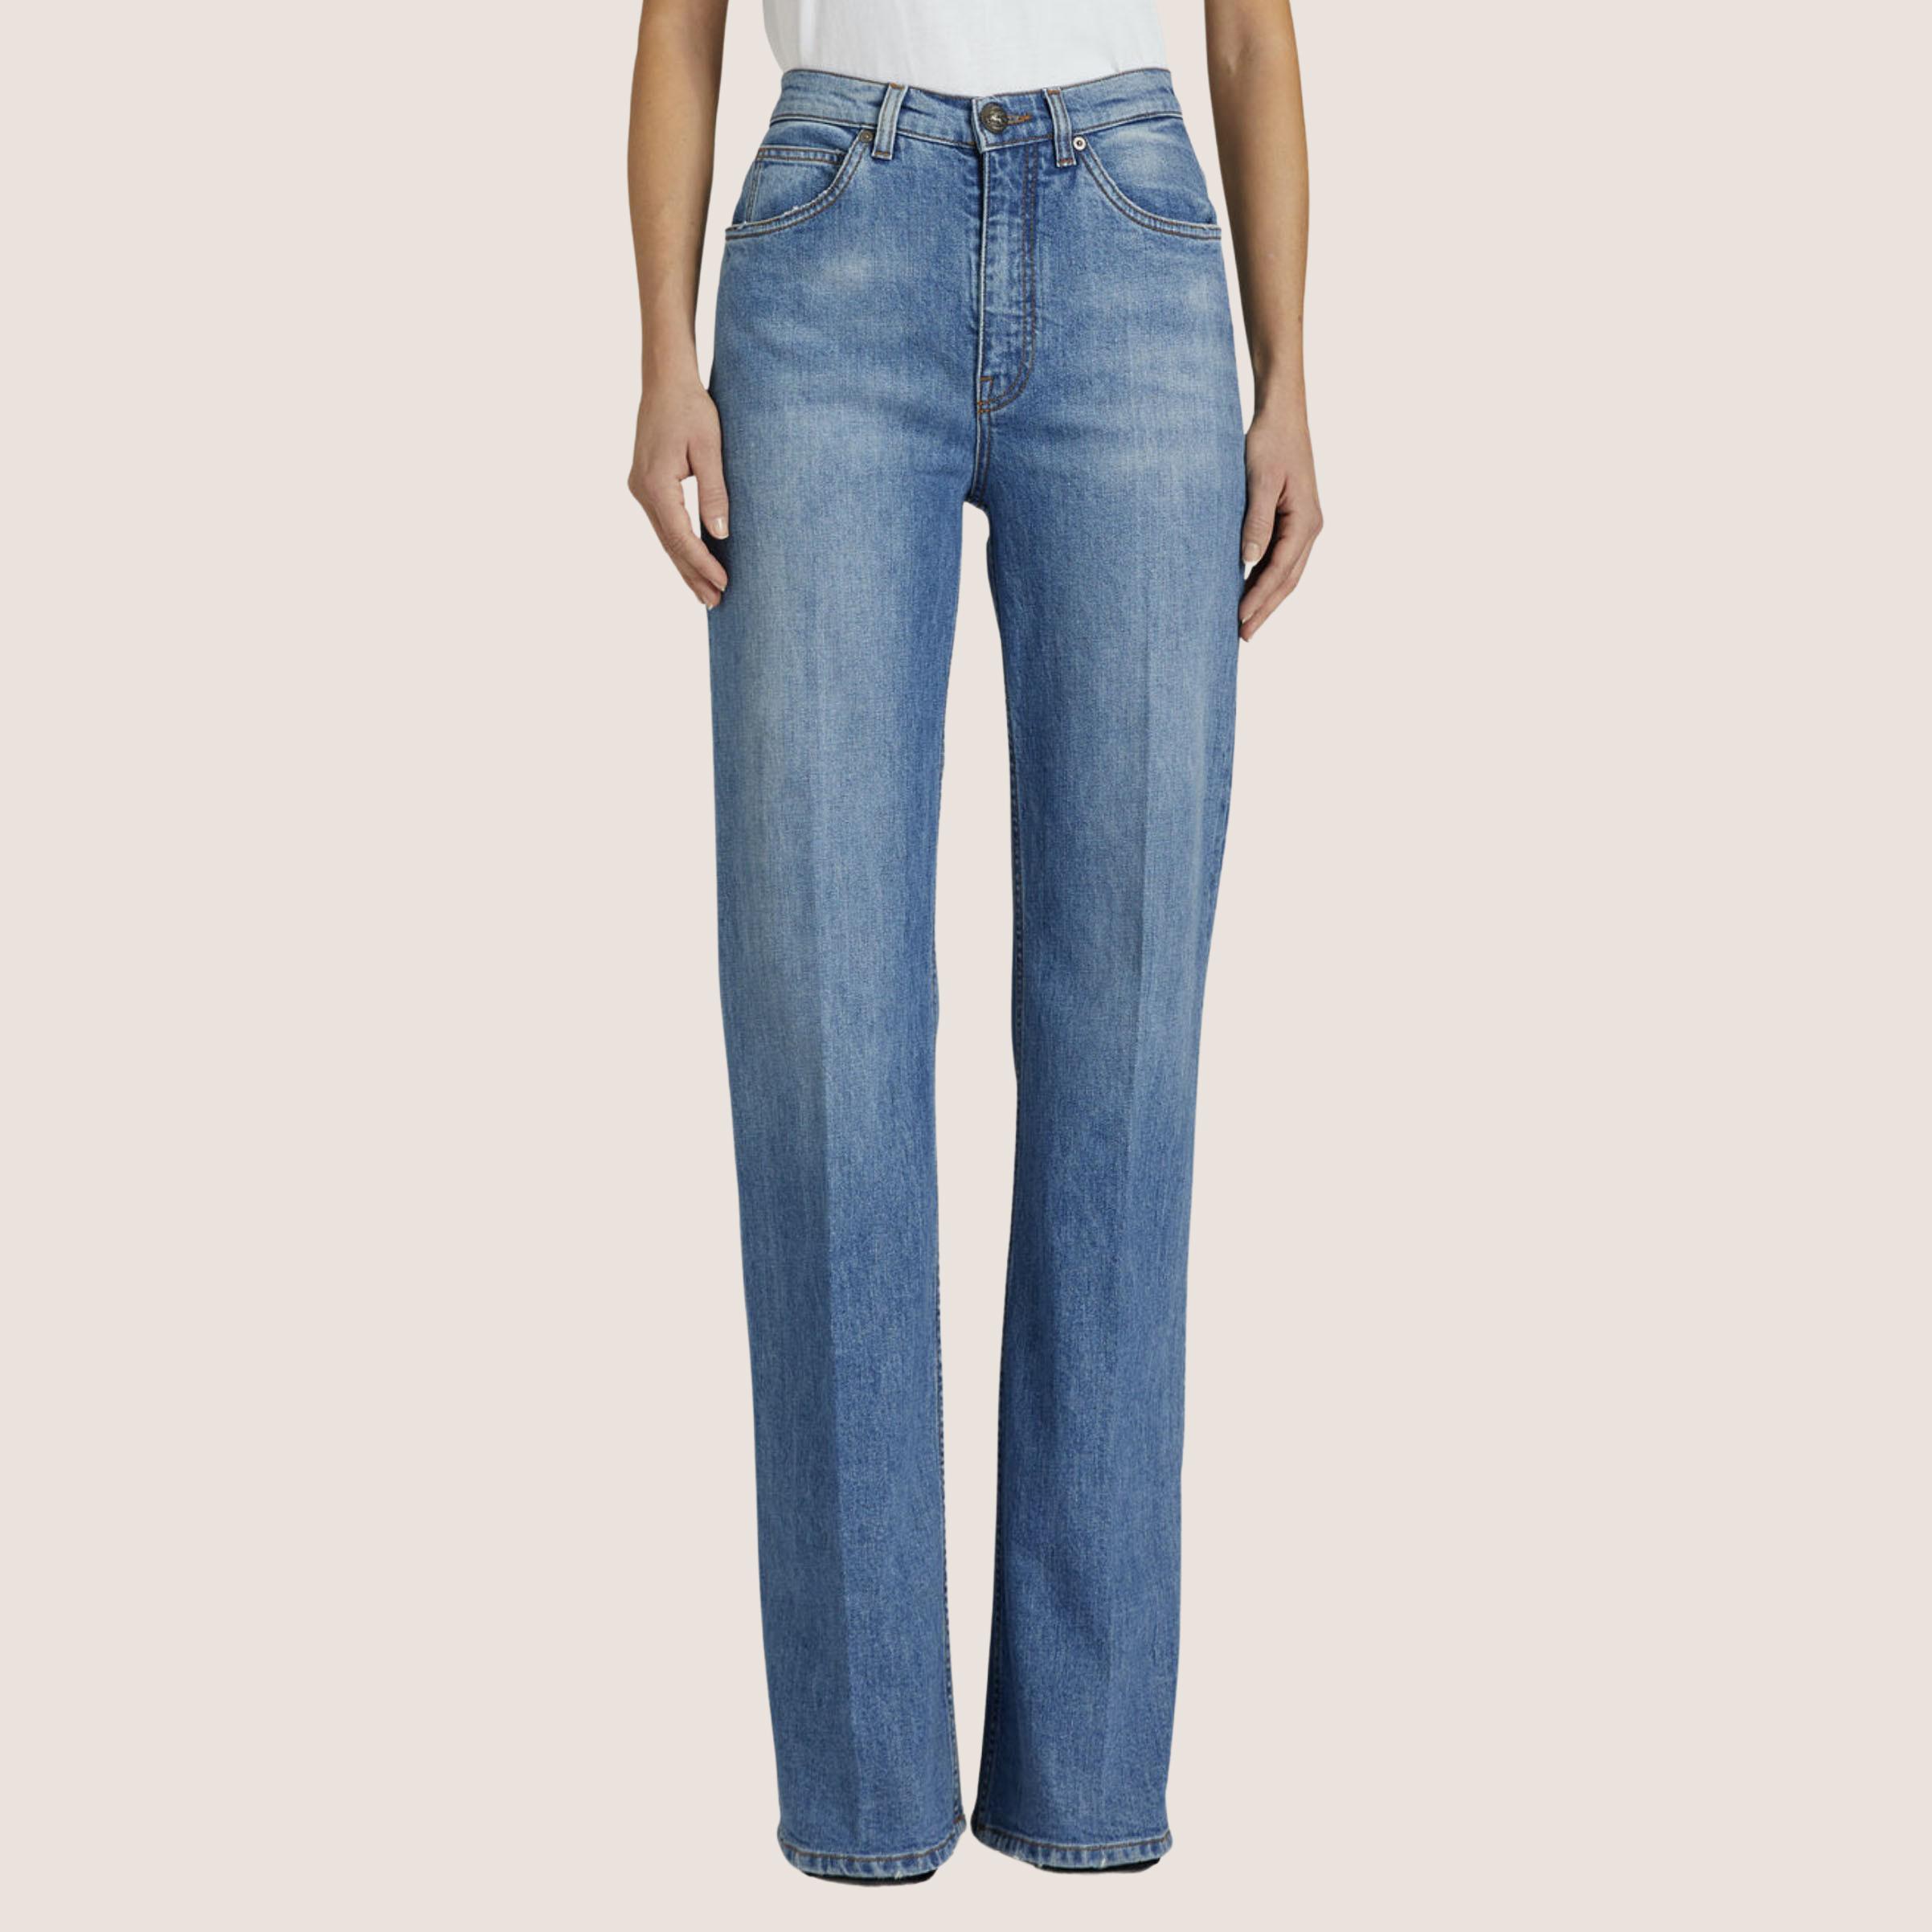 High Waist Flair Jeans